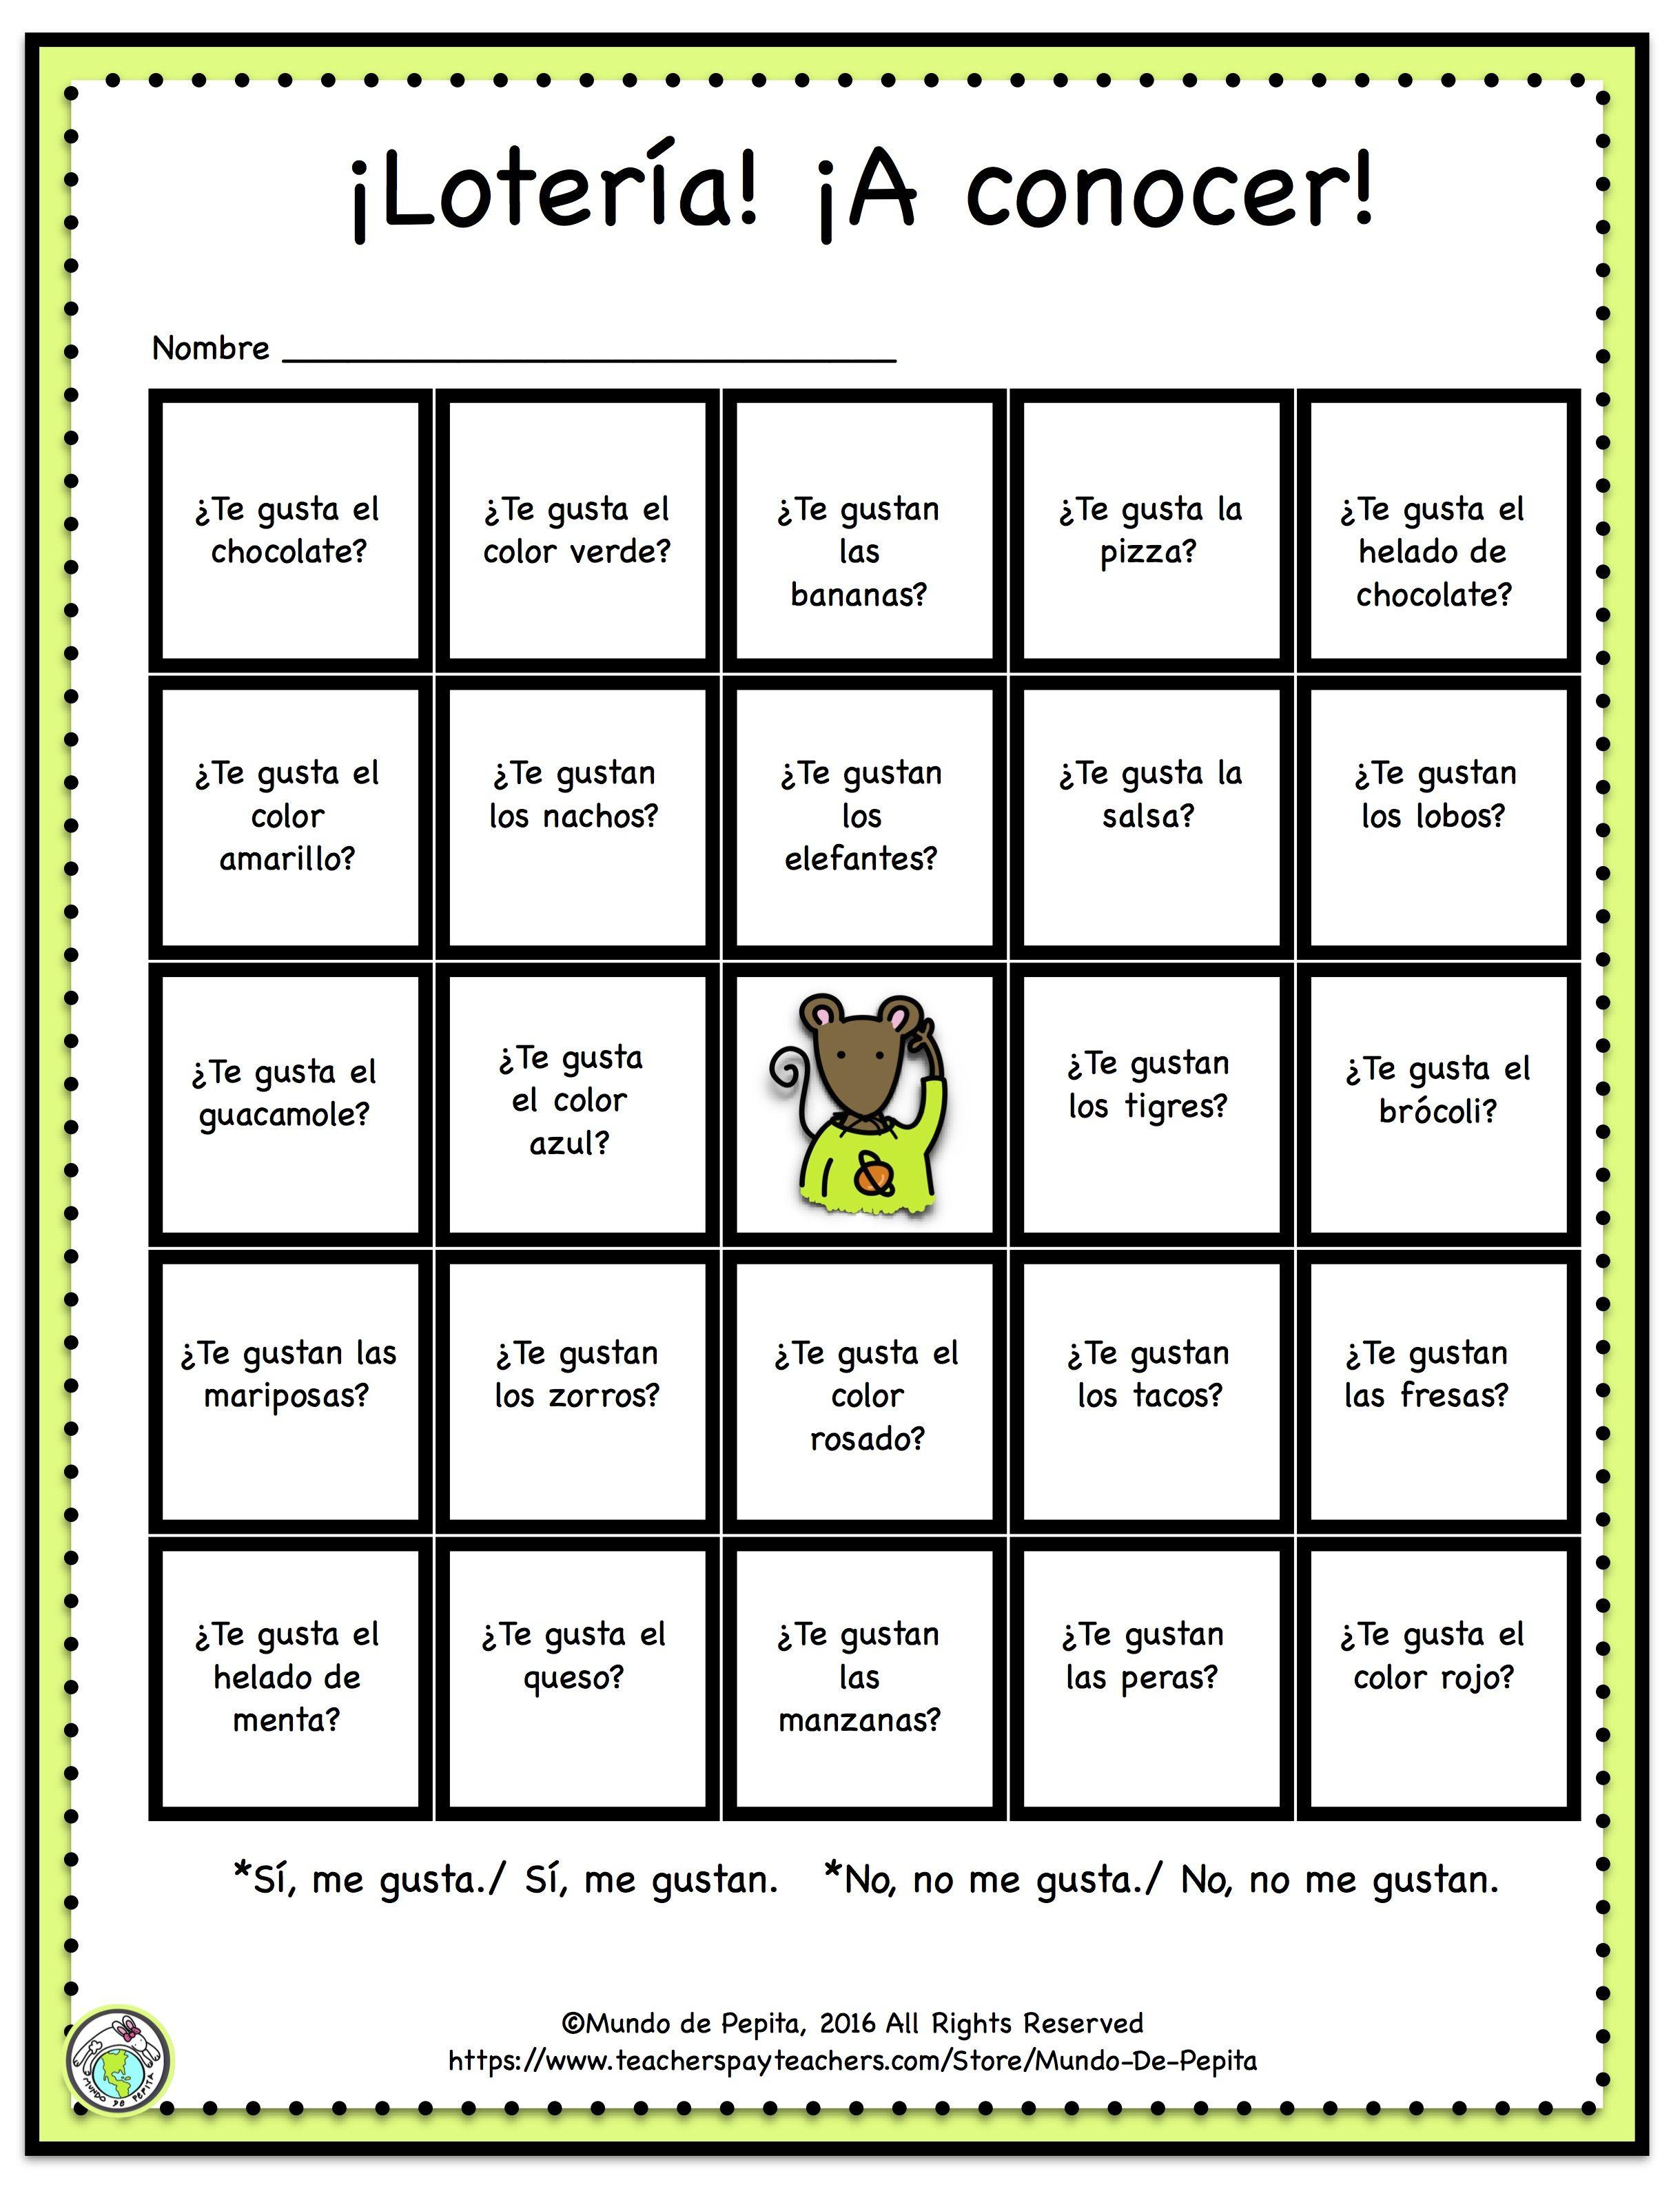 Loteria Printable Game Board Featuring Gustar | Spanish Kids - Free Printable Loteria Game